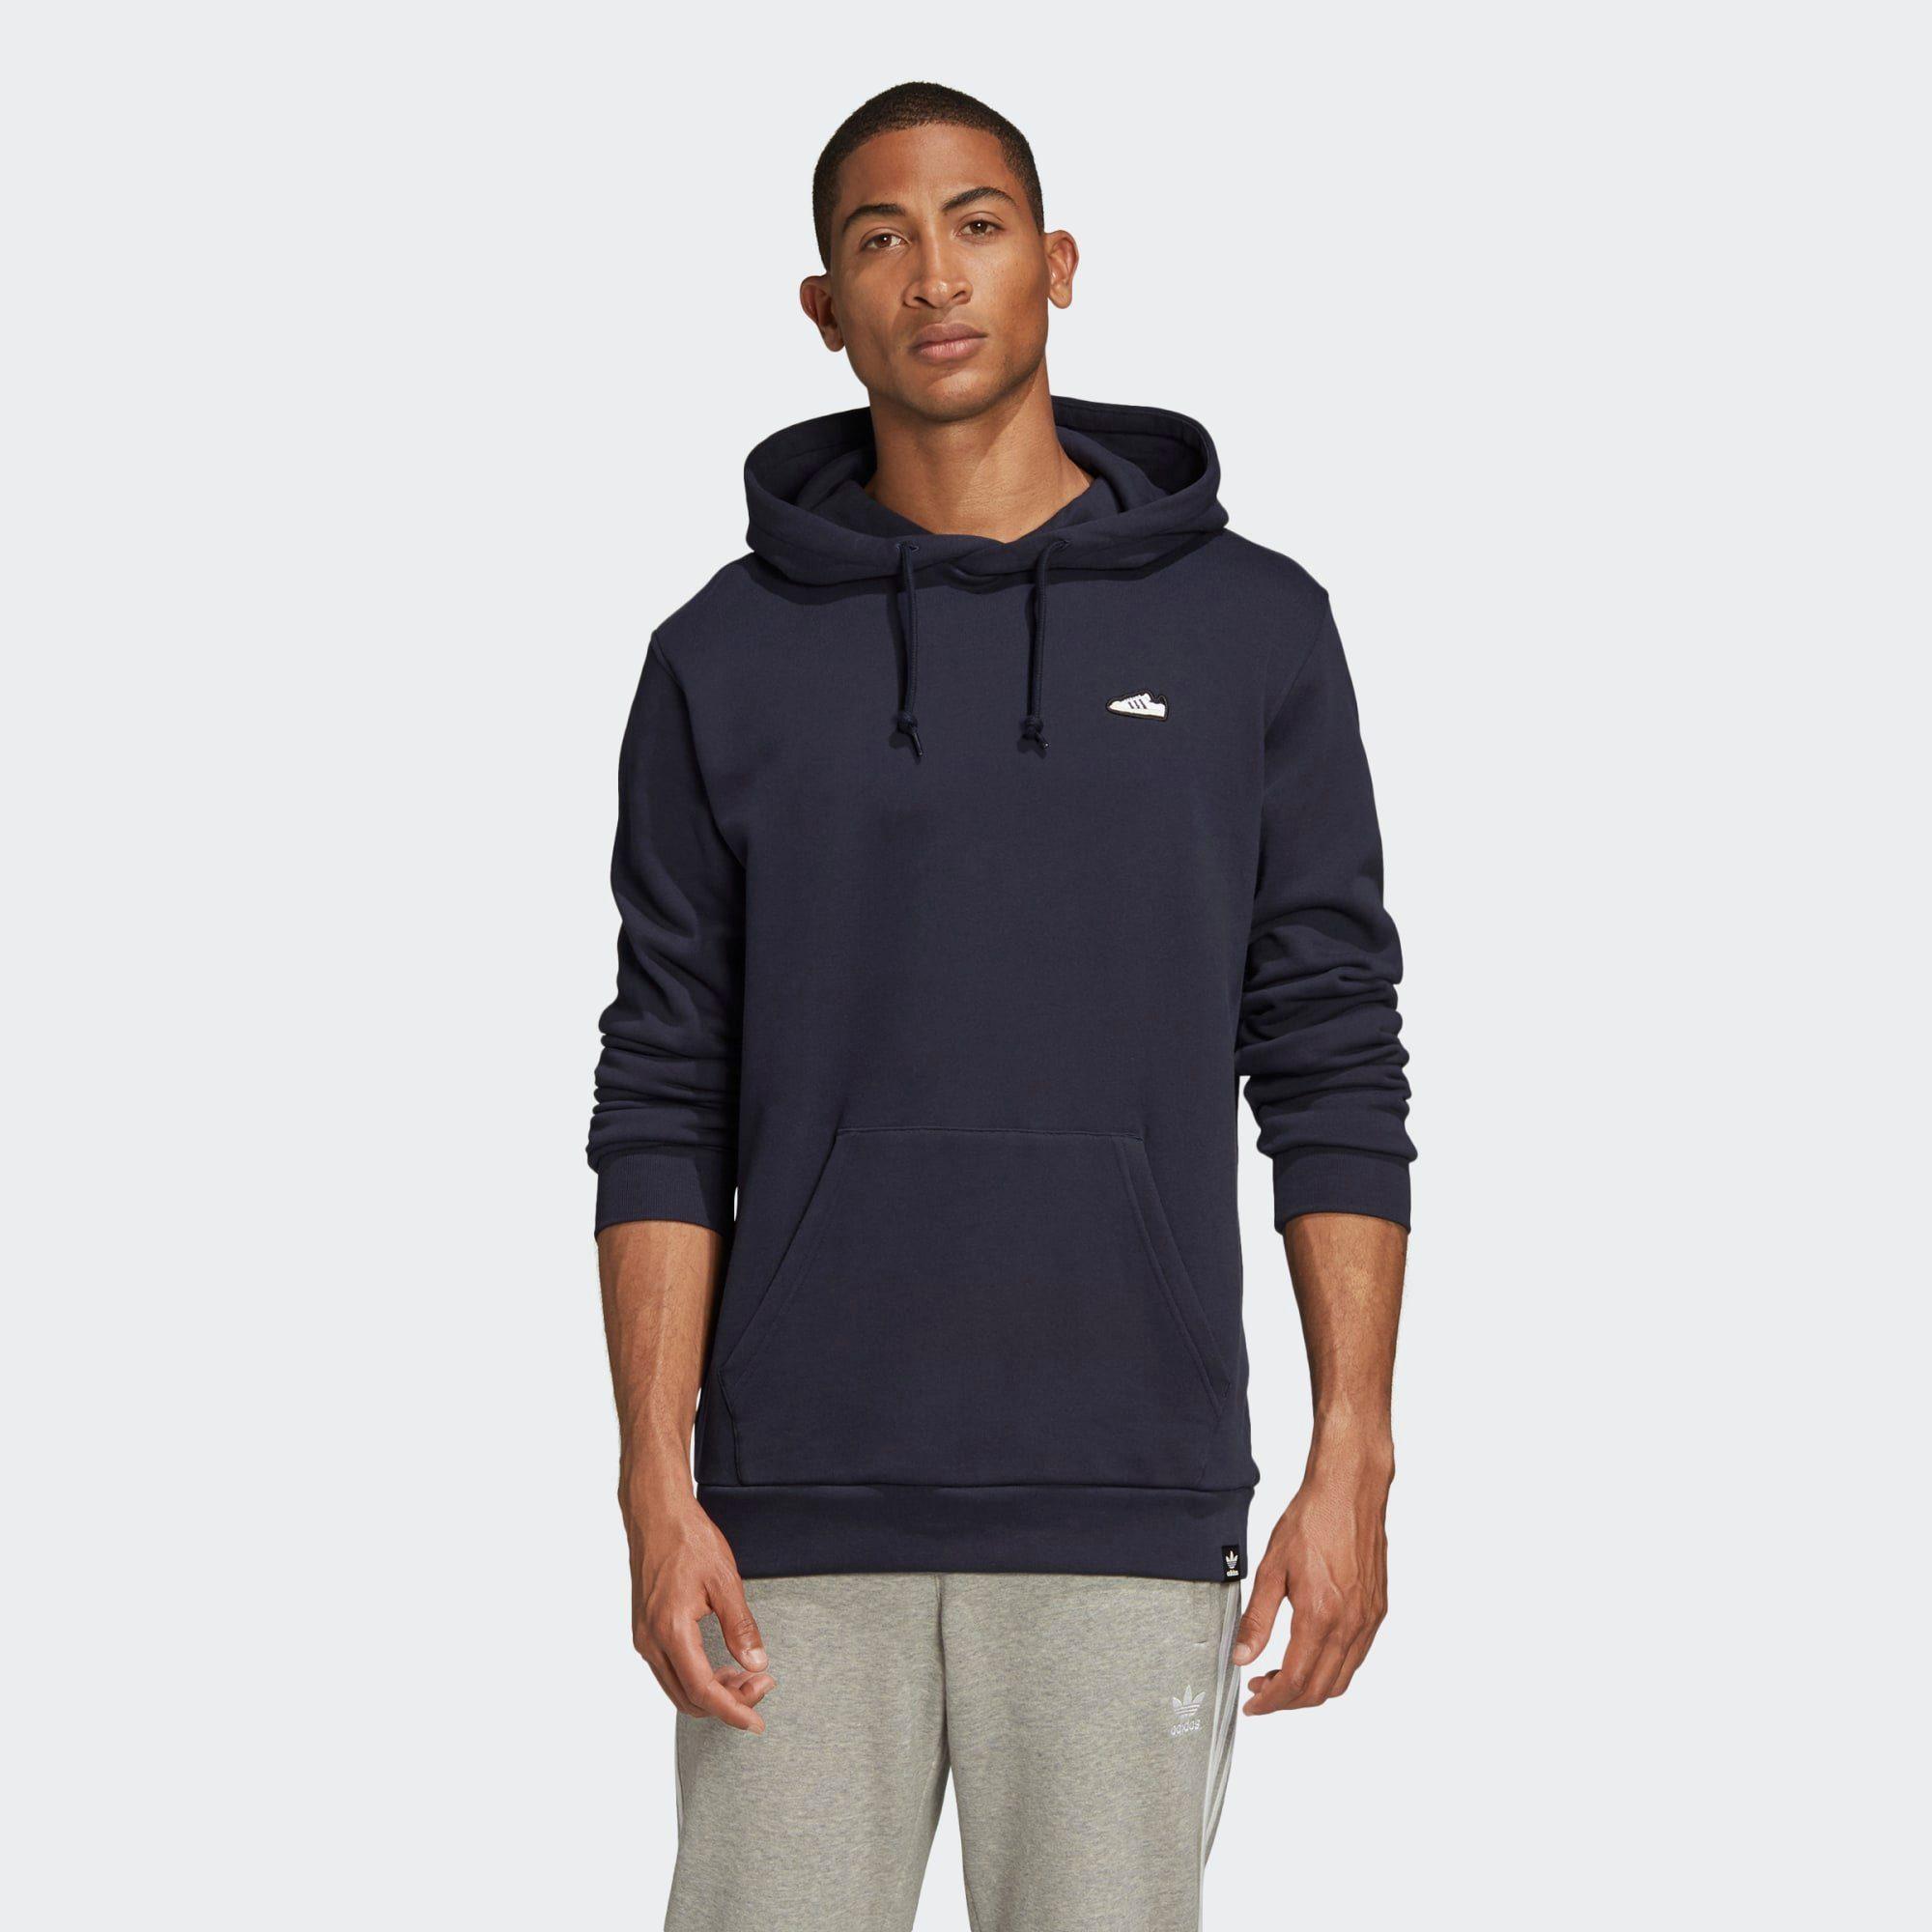 adidas Originals Hoodie »Hoodie« Graphics kaufen | OTTO